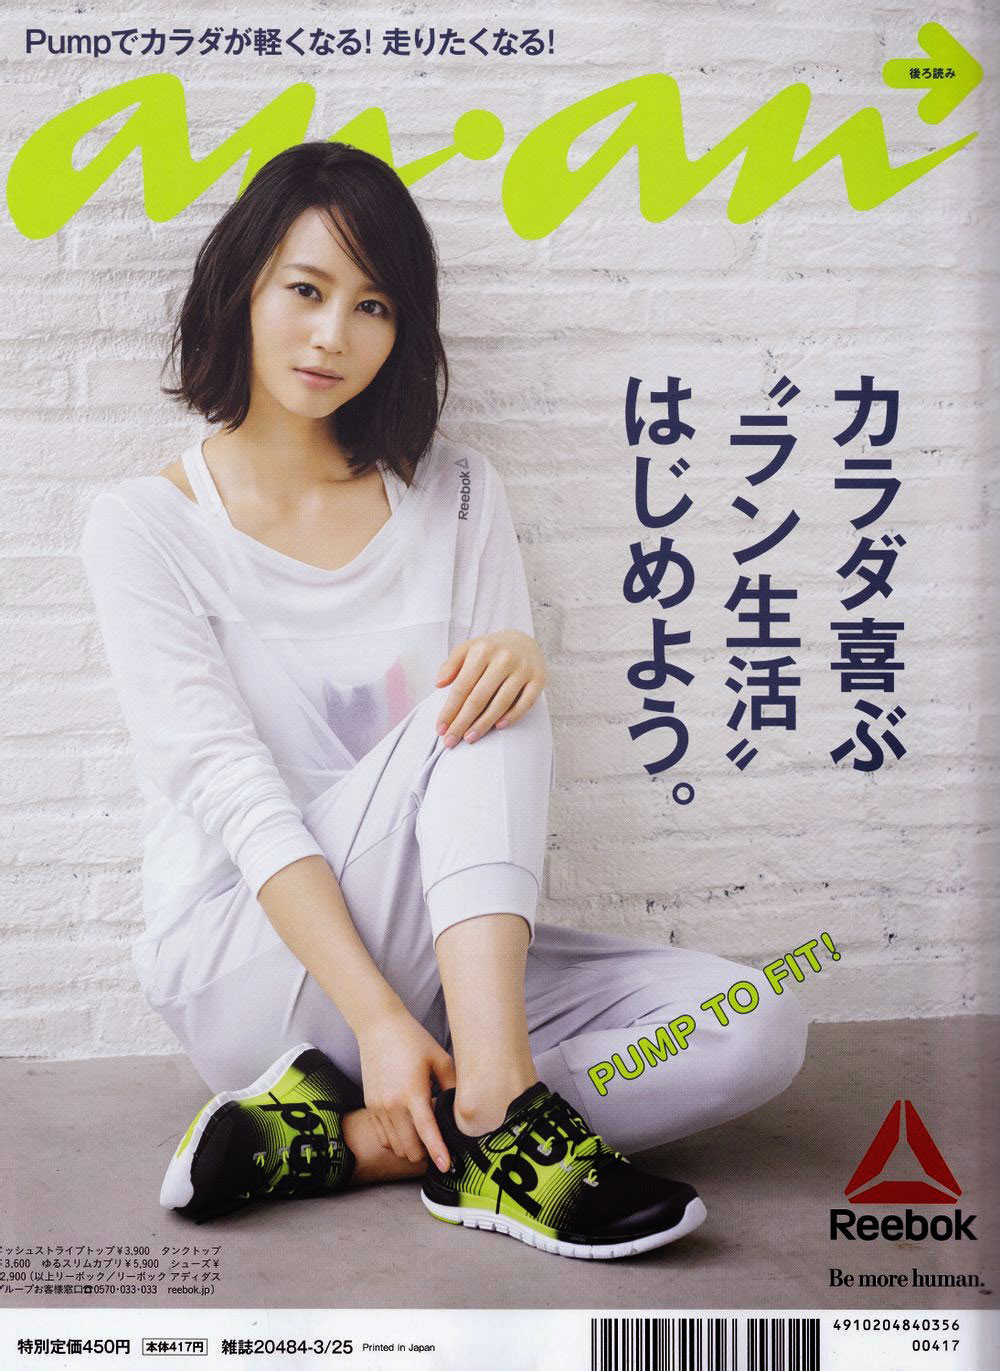 Maki Horikita Anan Magazine Reebok